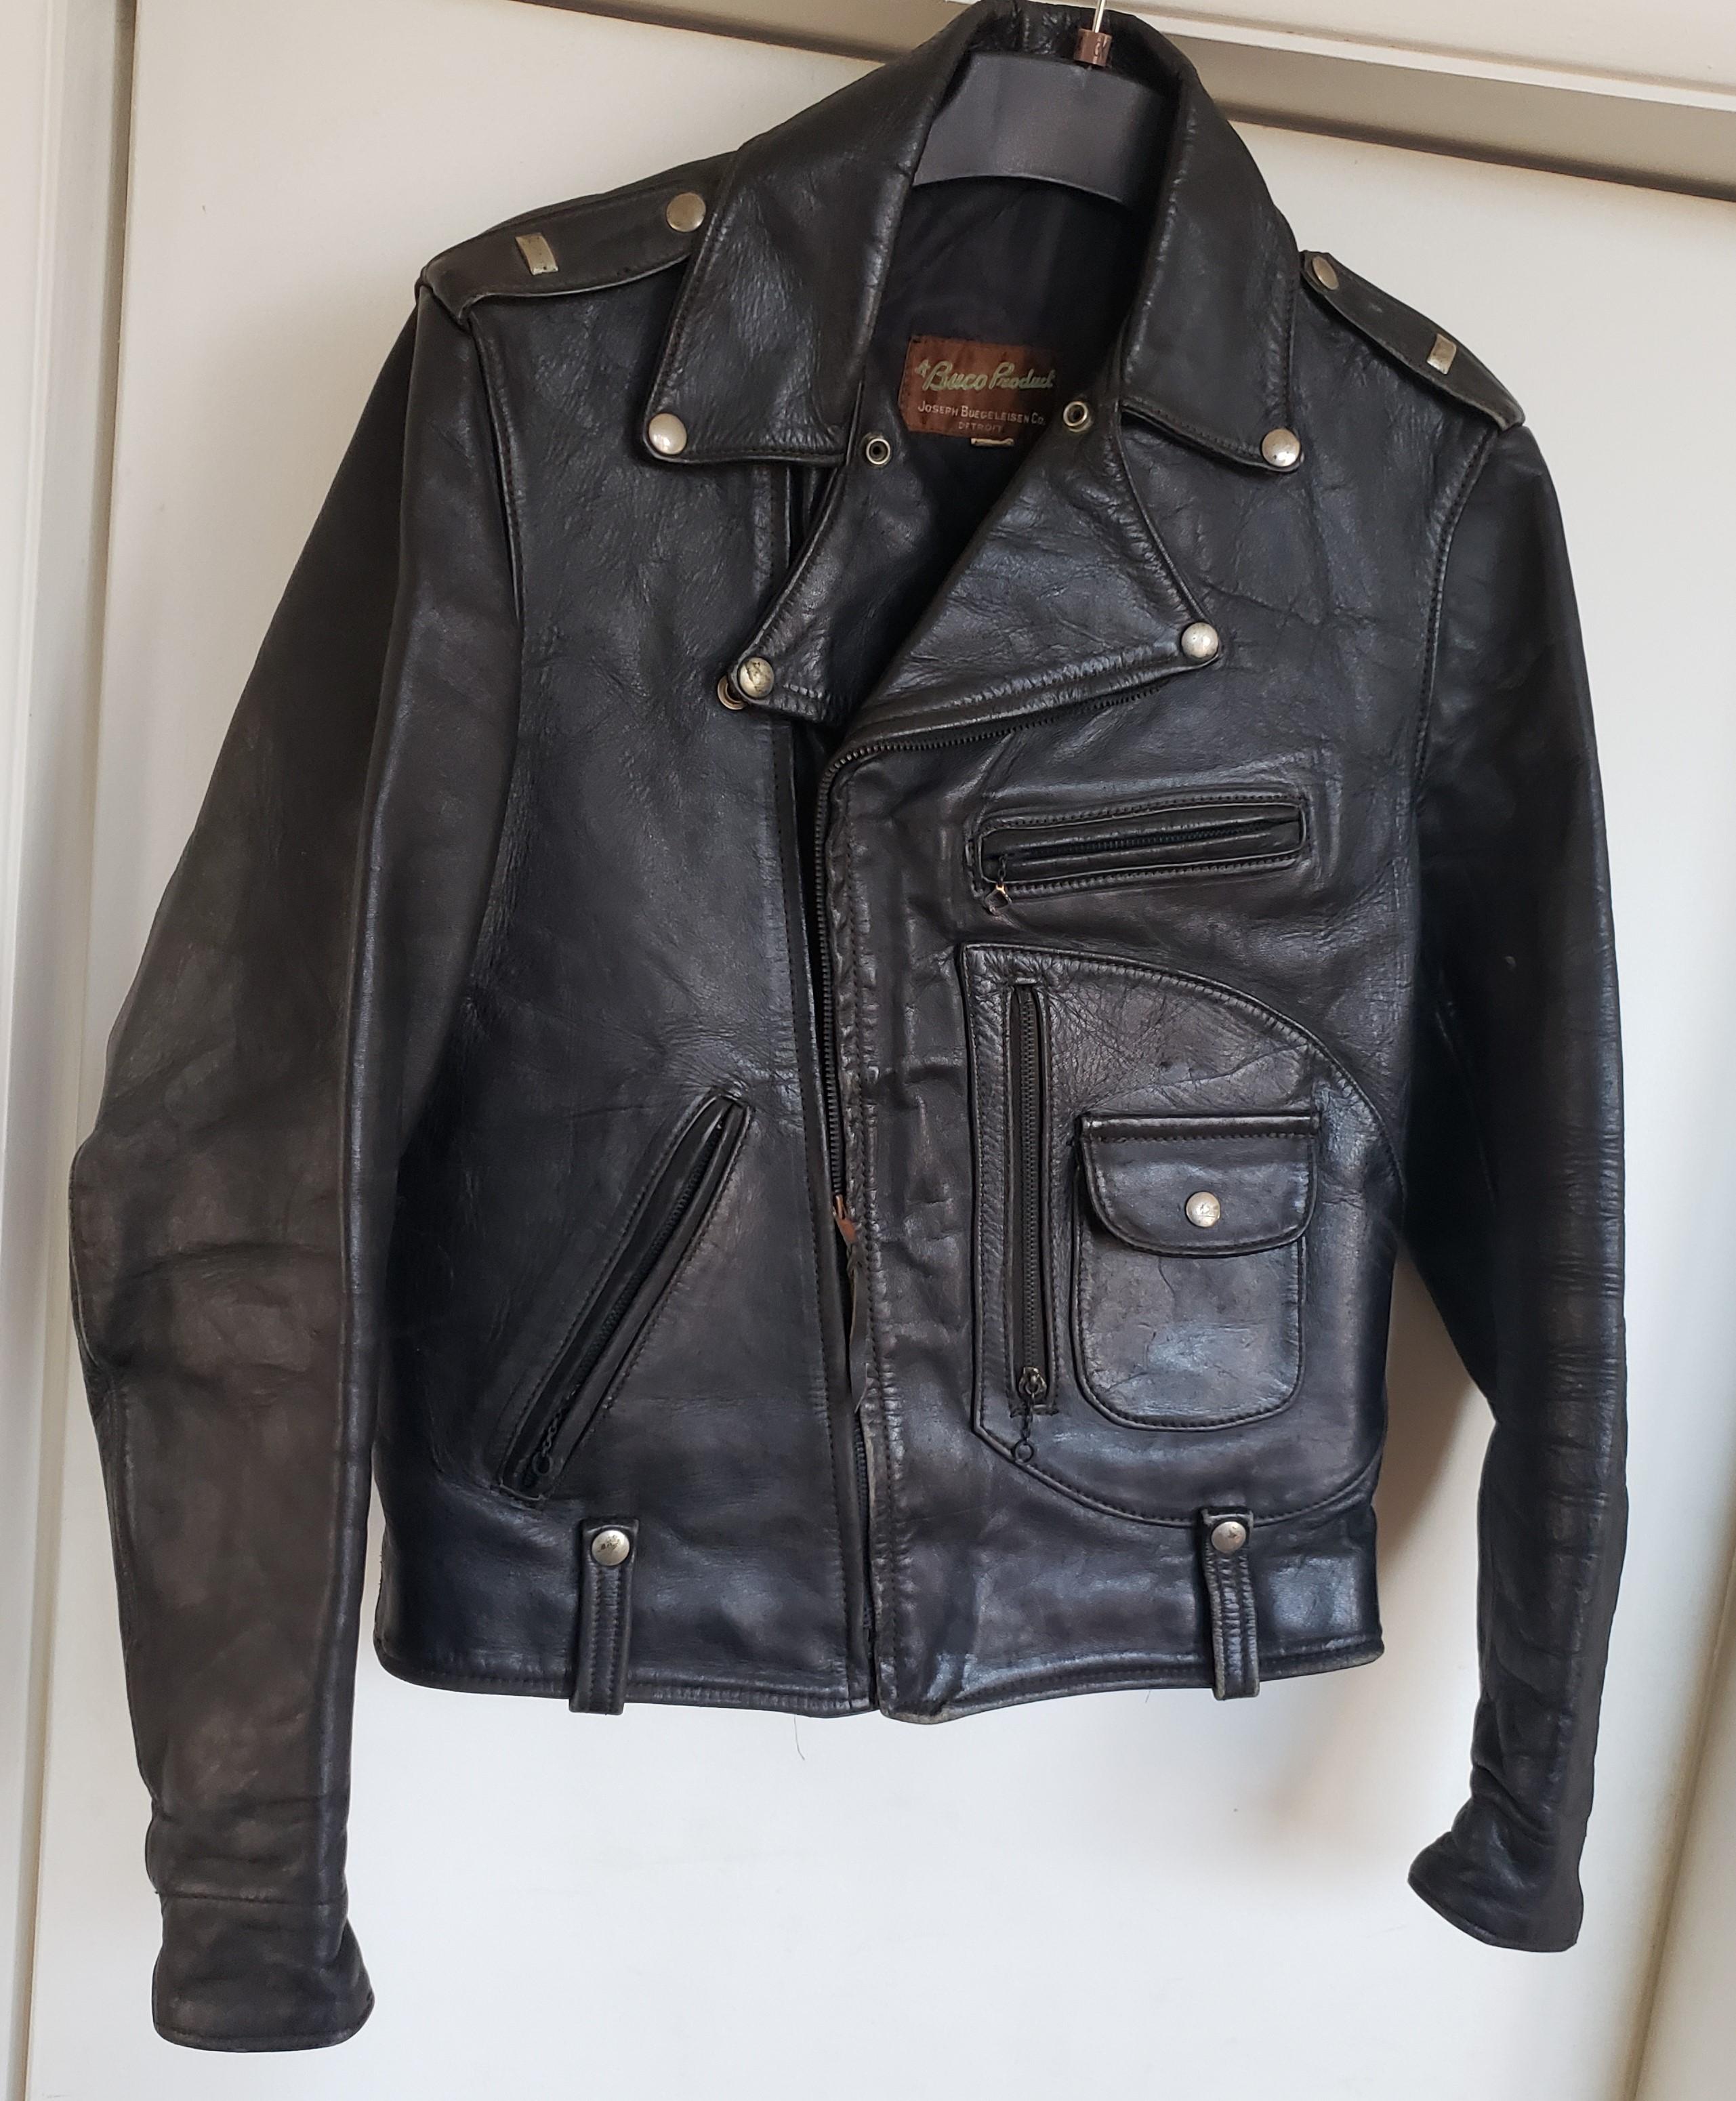 Vintage Buco Jacket 1940 S Label J 24 Style Age Value Help Value The Fedora Lounge Stylish Mens Outfits Leather Jacket Mens Fashion [ 3101 x 2562 Pixel ]